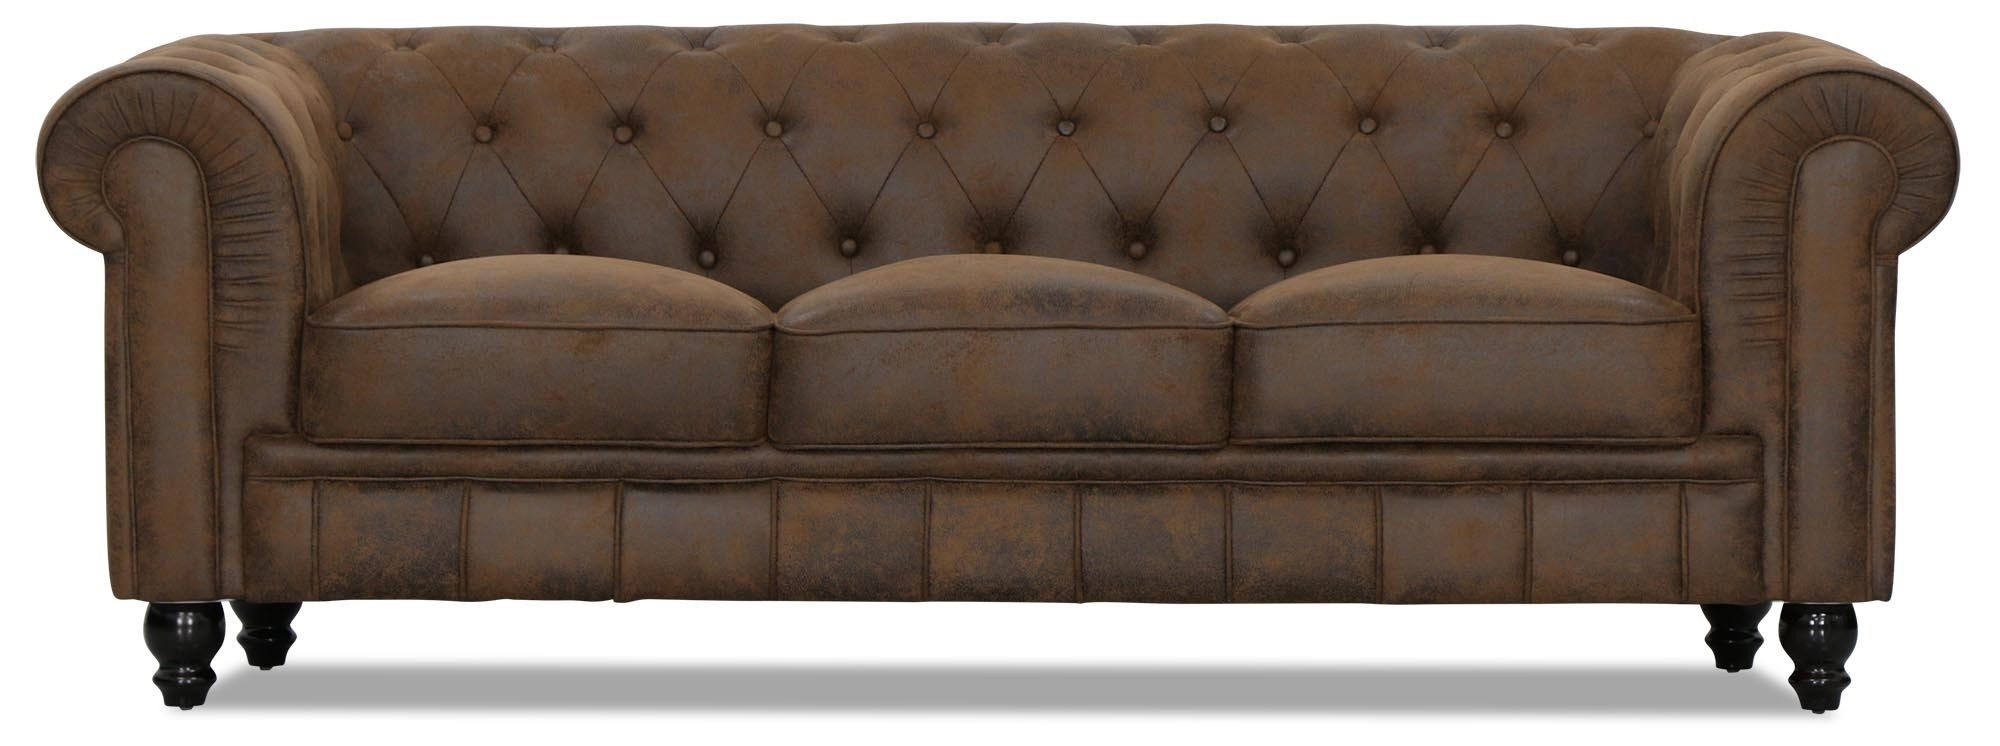 Benjamin Classical 3 Seater Pu Leather Sofa Vintage